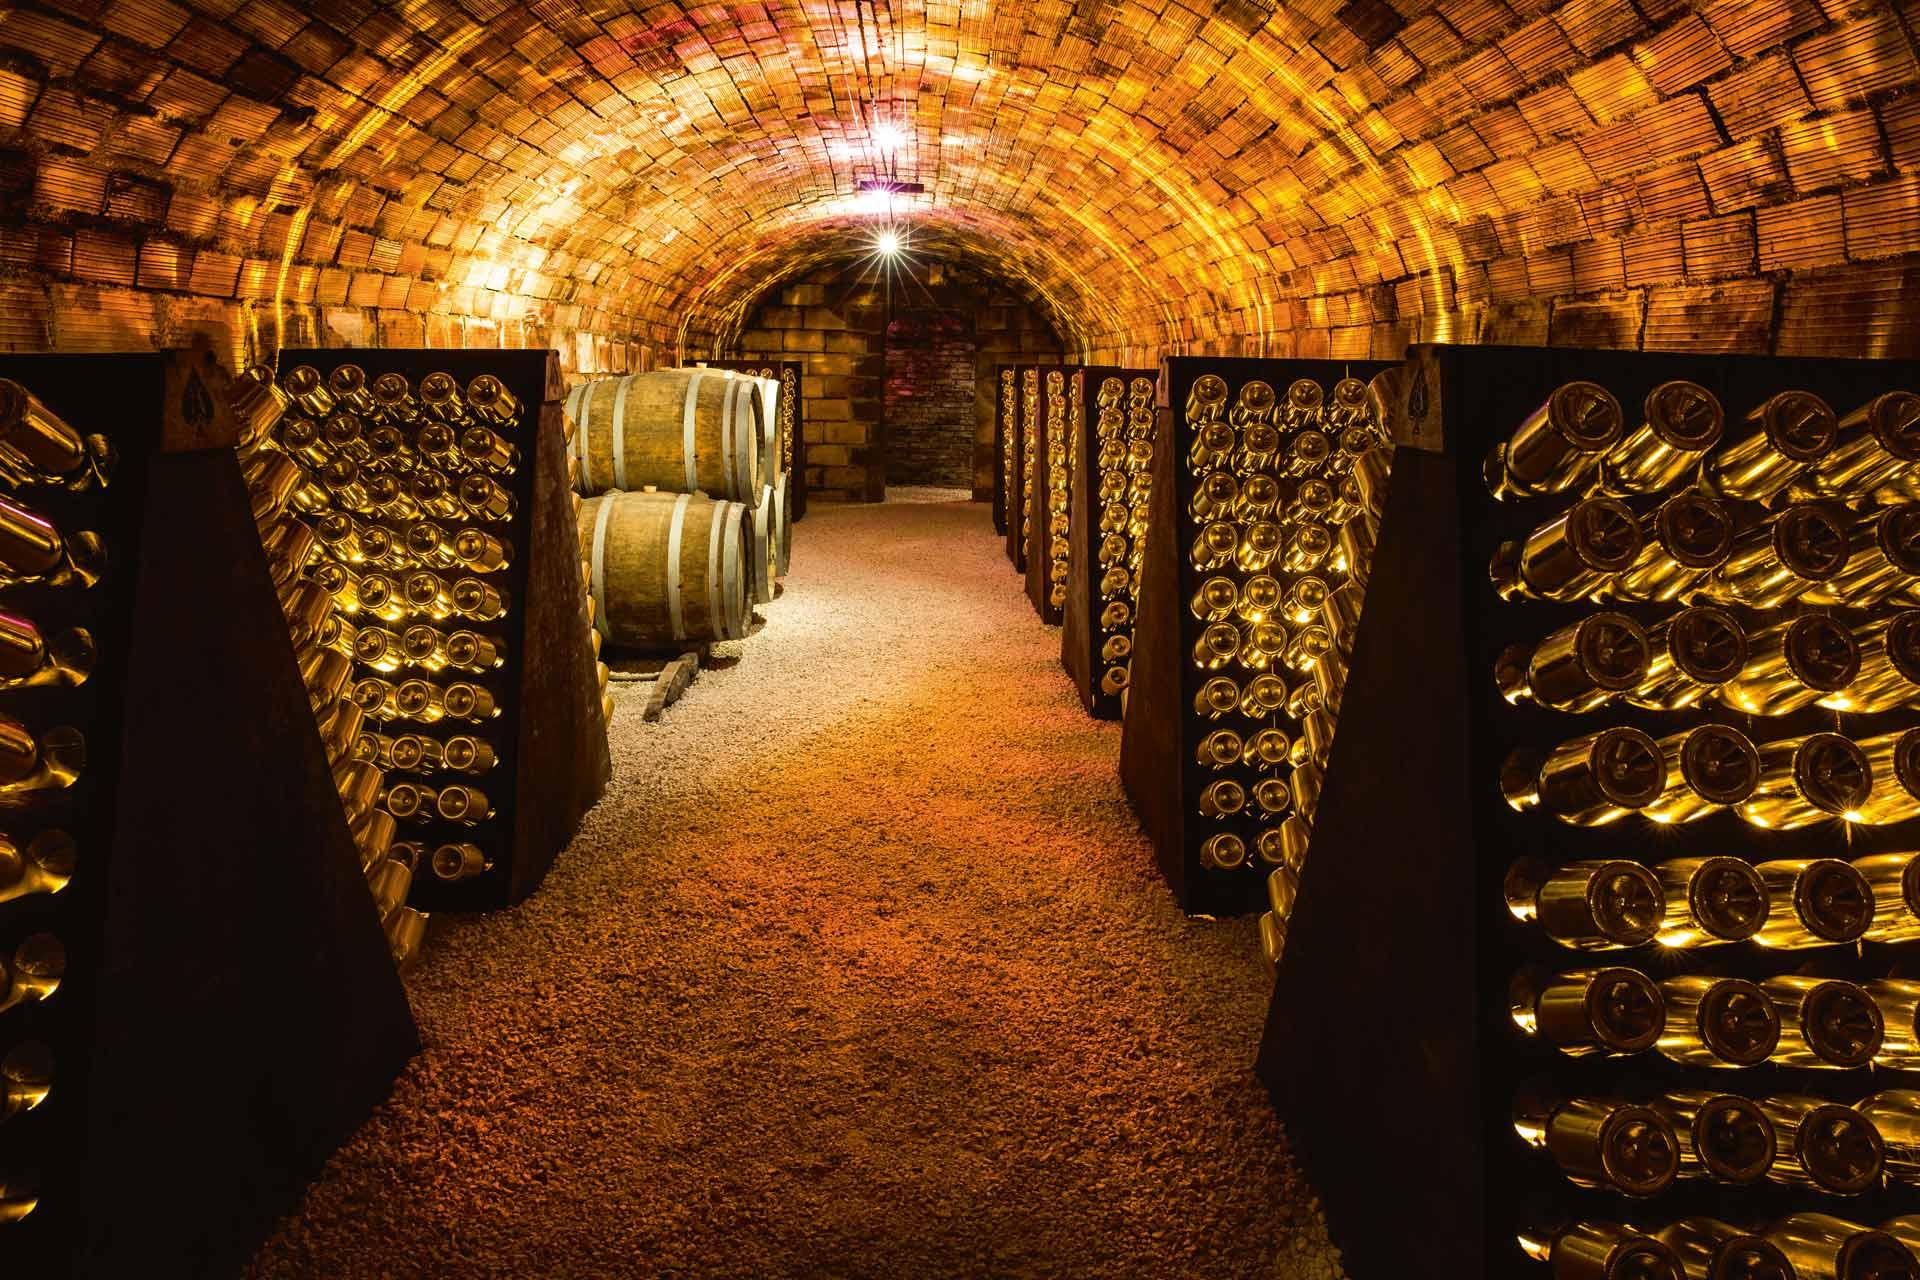 Wine cellar for Jay-Z's champagne brand Armand de Brignac